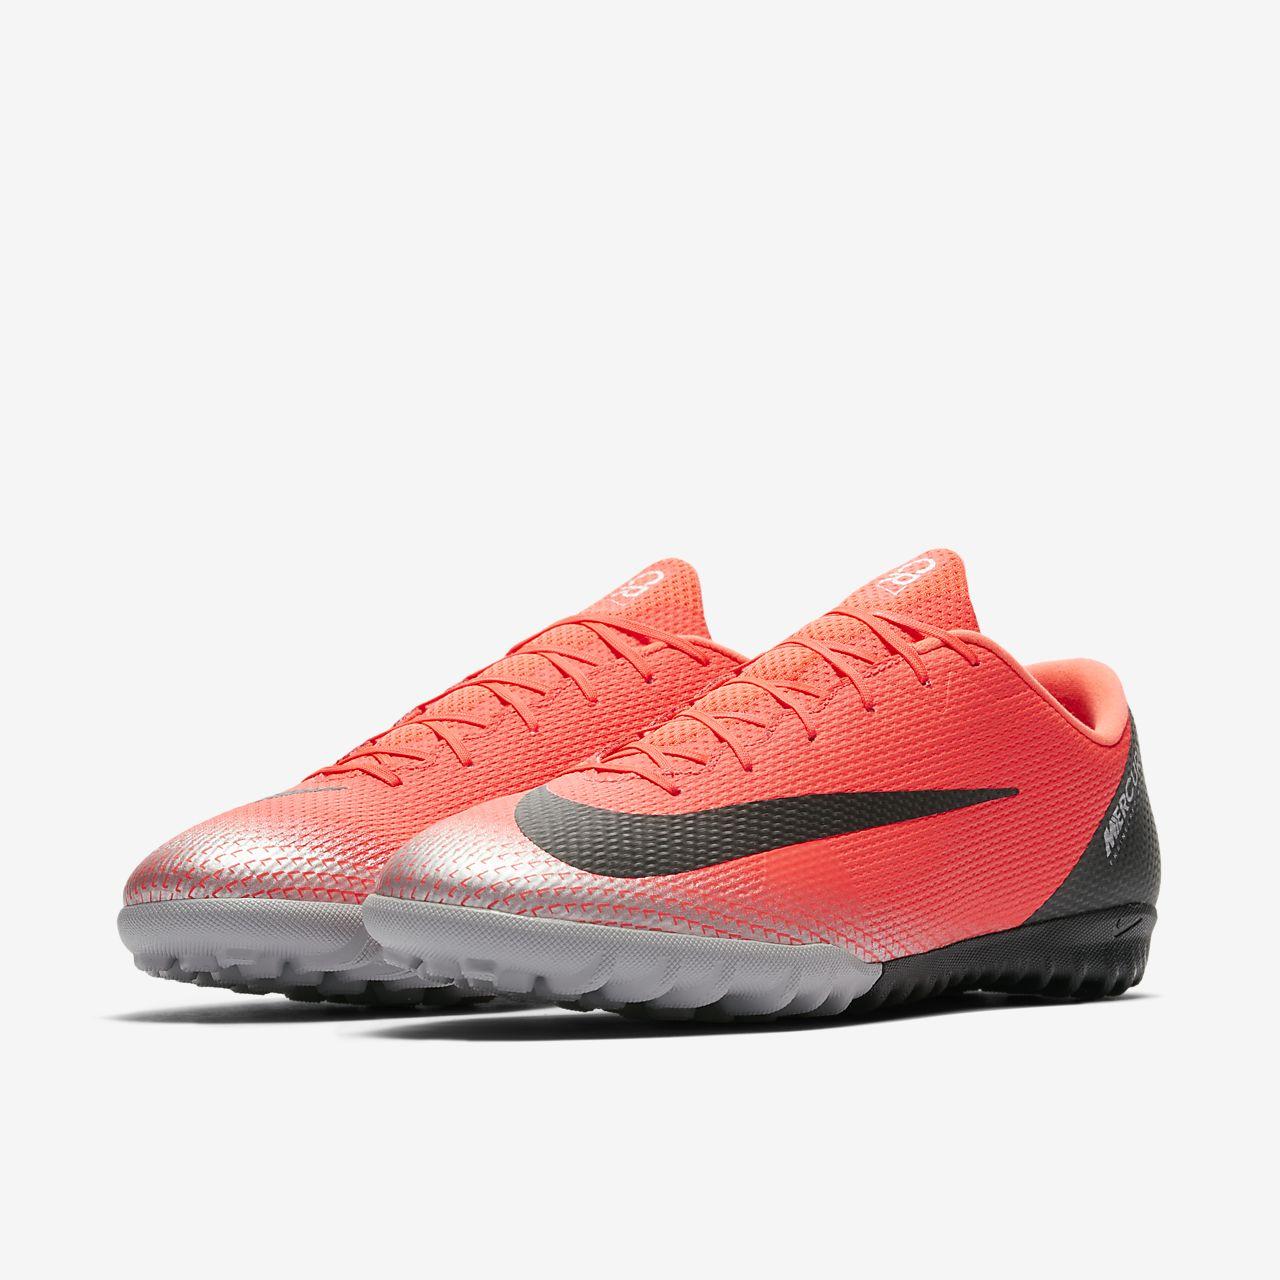 9a1ee01bb Nike MercurialX Vapor XII Academy CR7 Turf Football Shoe. Nike.com IN